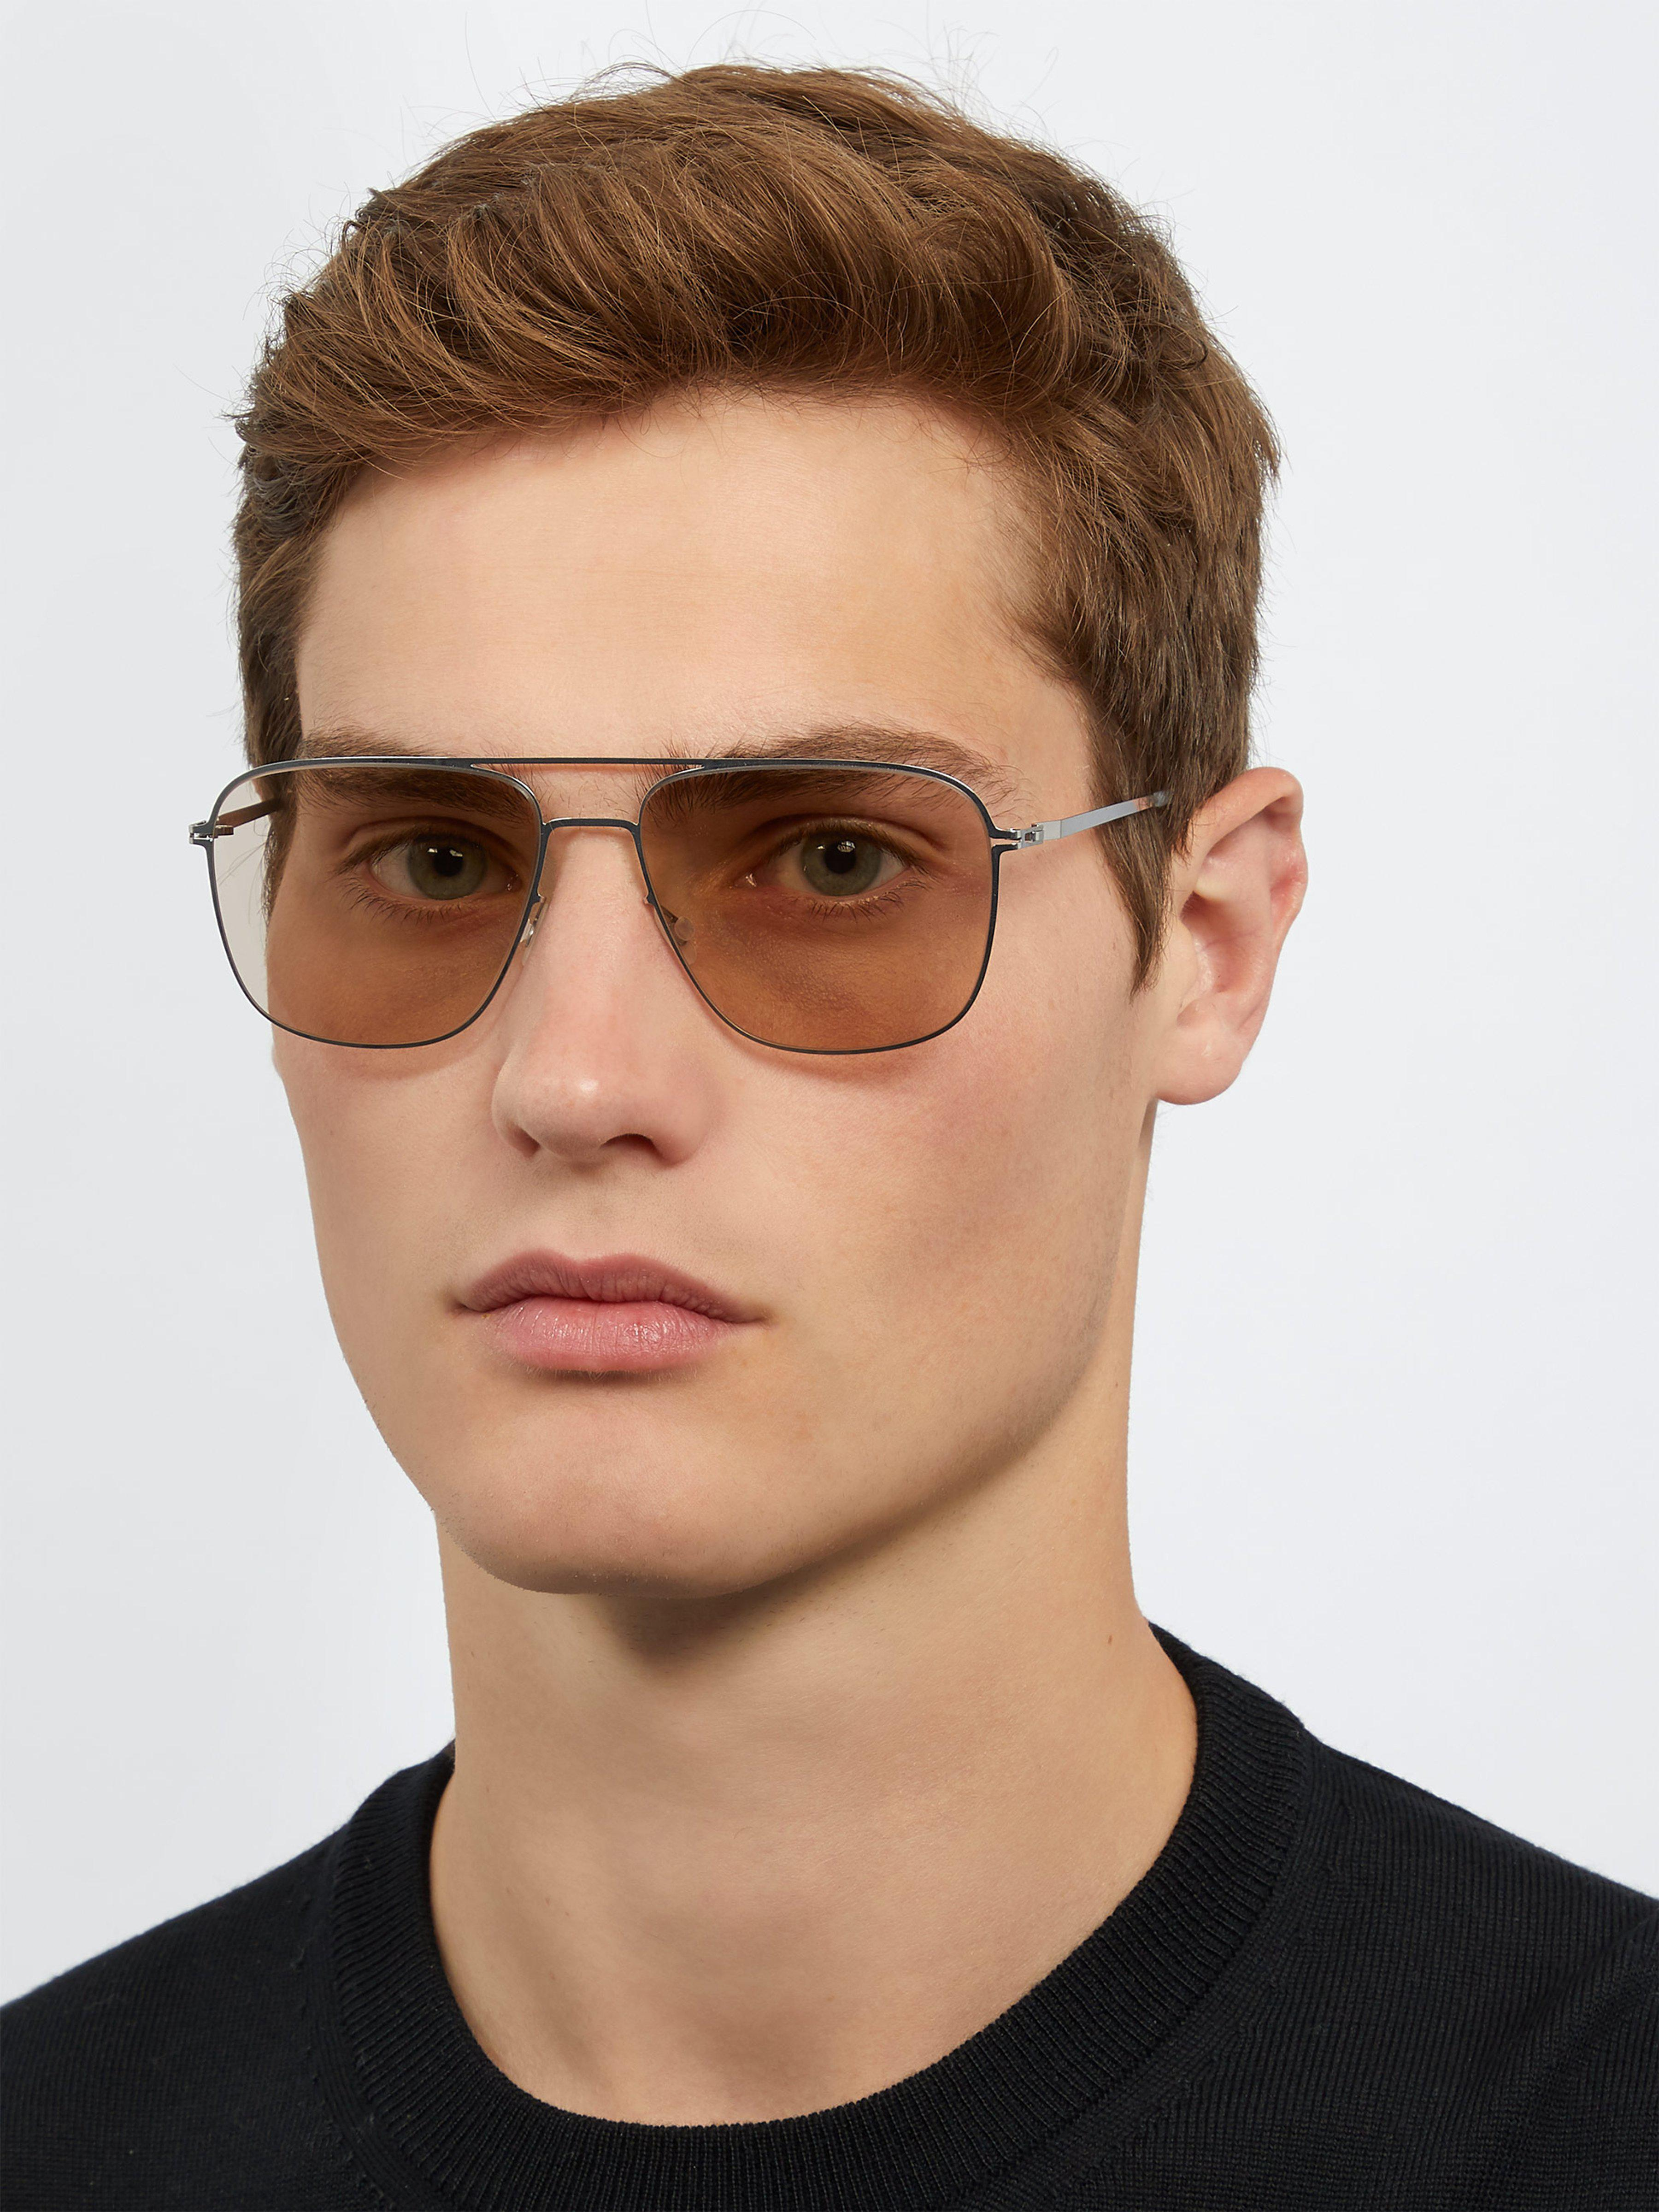 ee1723543e82b Mykita Rankin Aviator Frame Sunglasses in Metallic for Men - Lyst